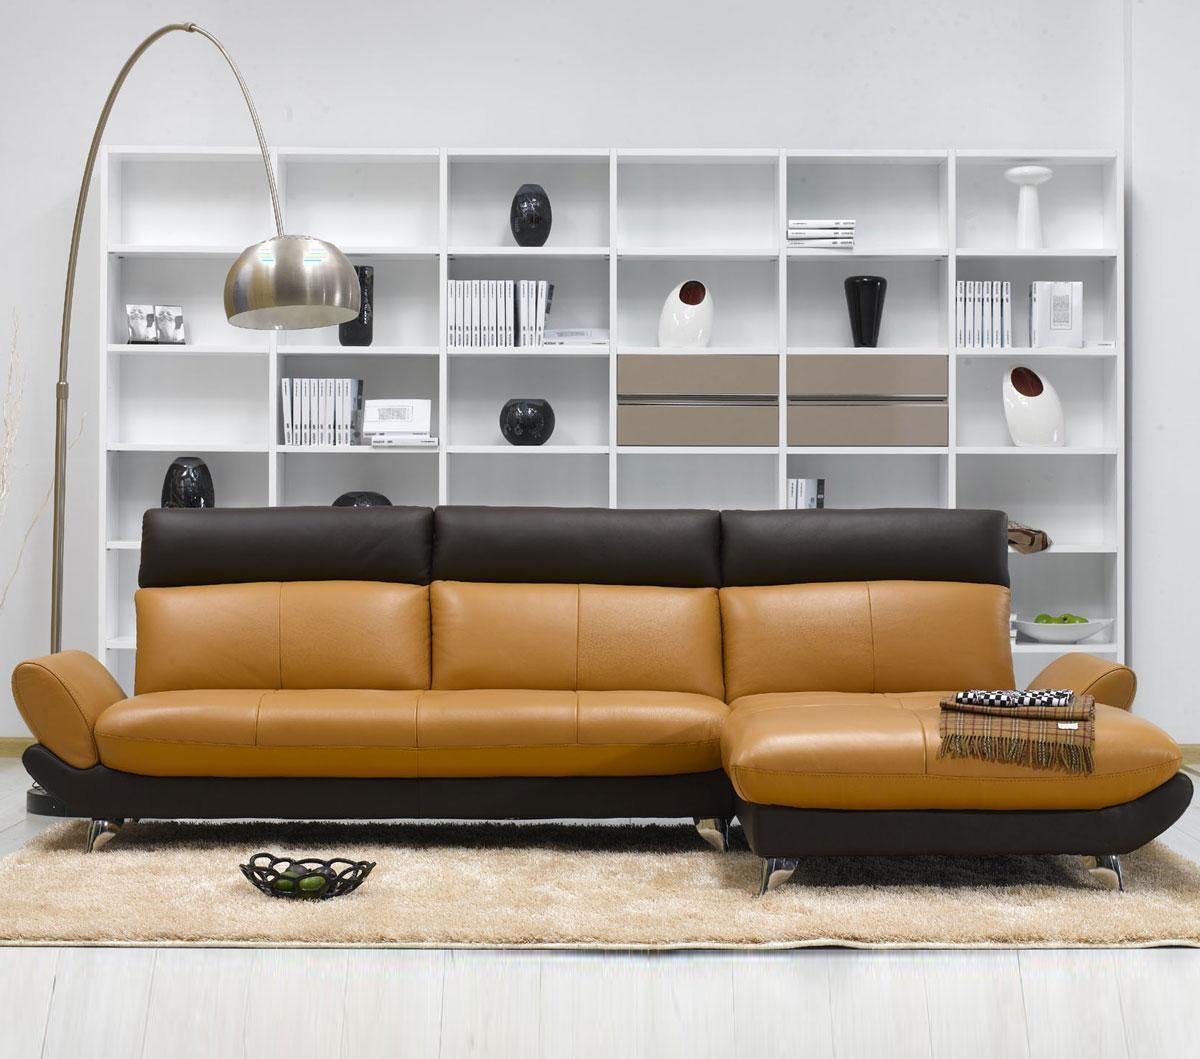 20 Choices Of White Leather Sofas: Customized Sofas 20 Choices Of Customized Sofas Sofa Ideas